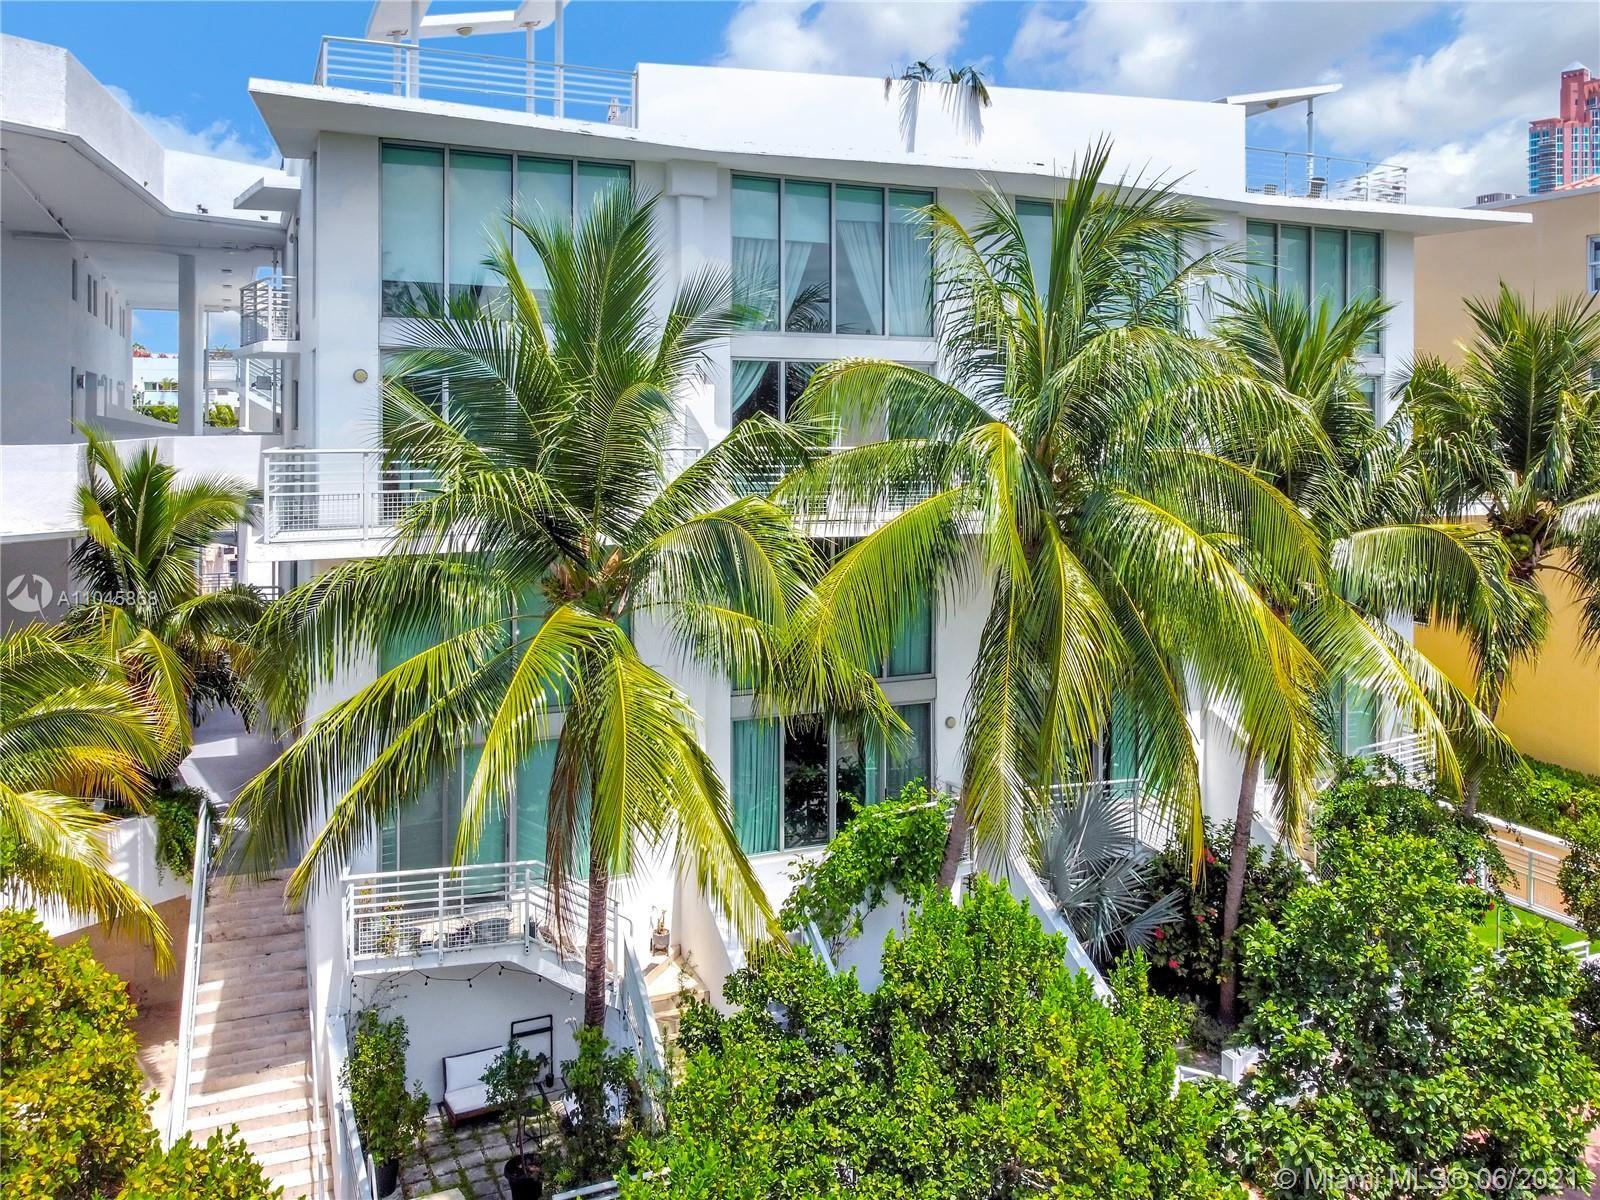 245 Michigan Ave #LG-3, Miami Beach, FL 33139 - #: A11045868